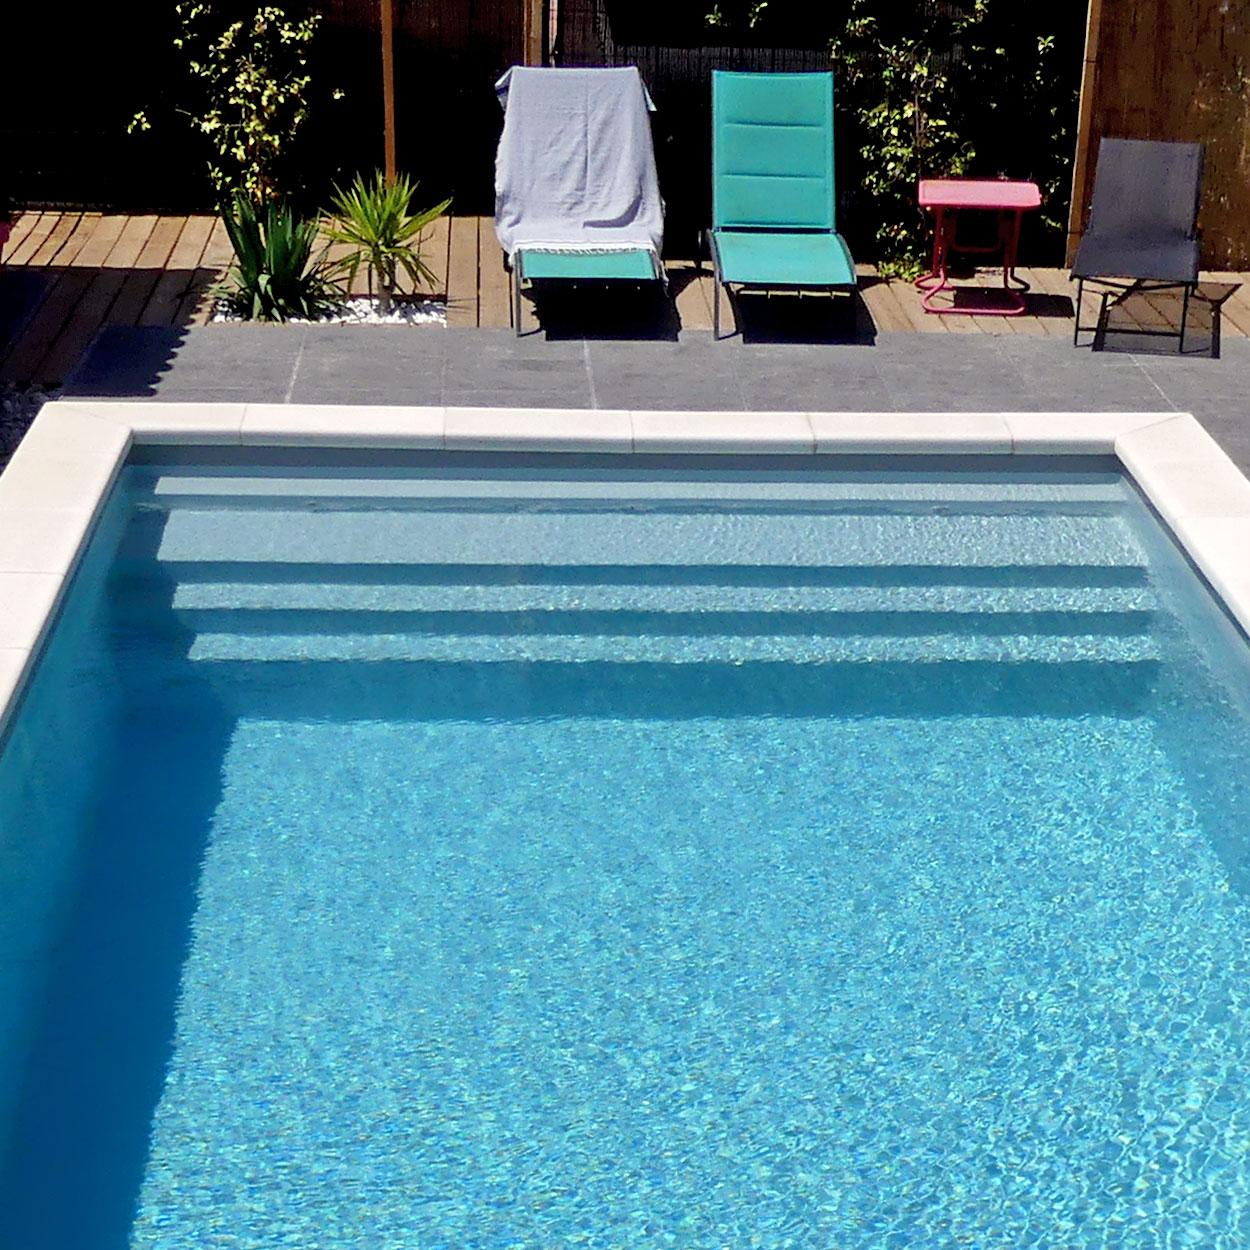 realisation-piscine-coque-podestat Modèle Podestat